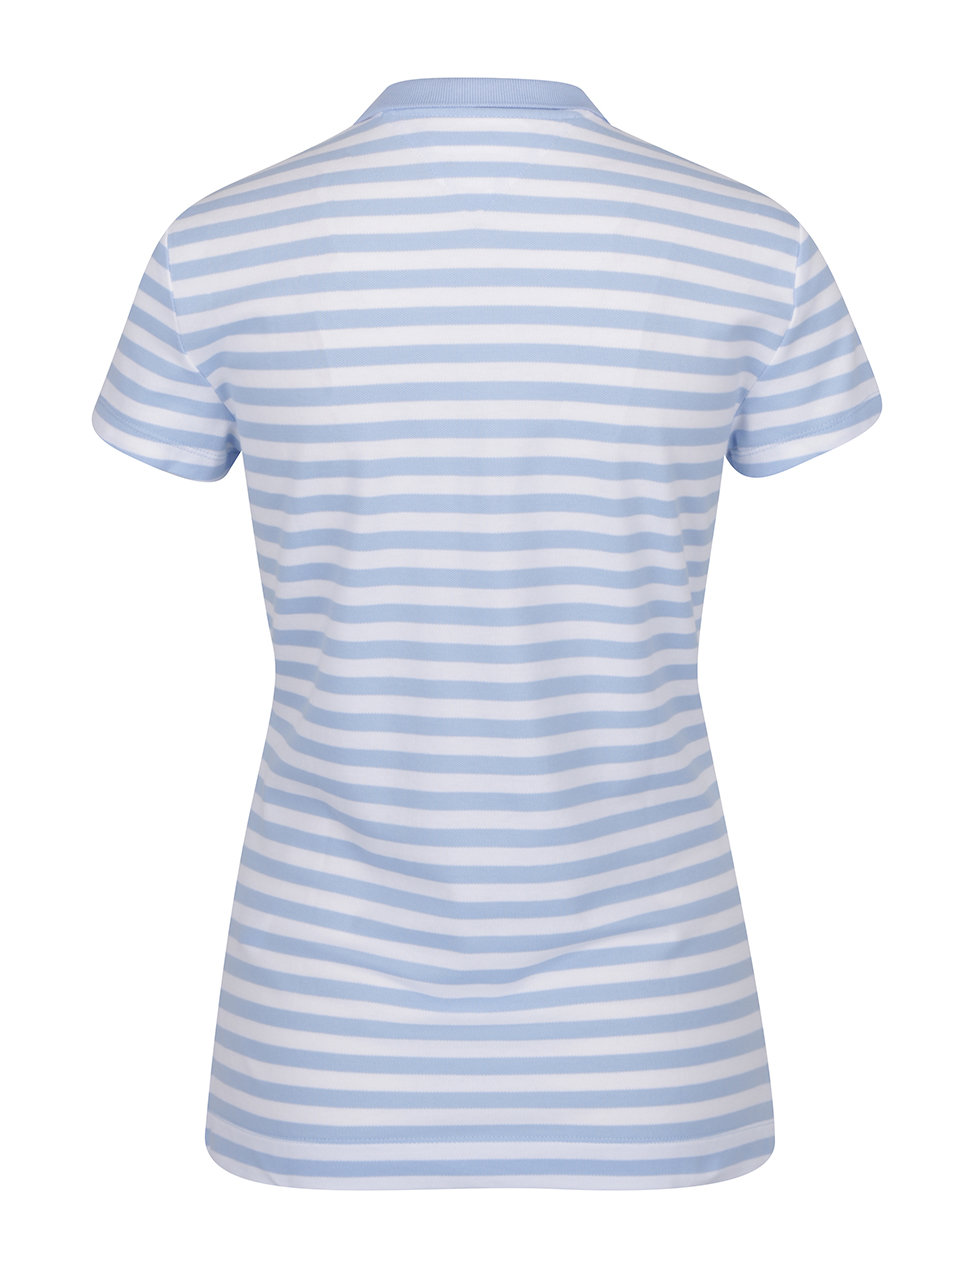 Modro-biela pruhovaná polokošeľa Tommy Hilfiger ... 829491d2004